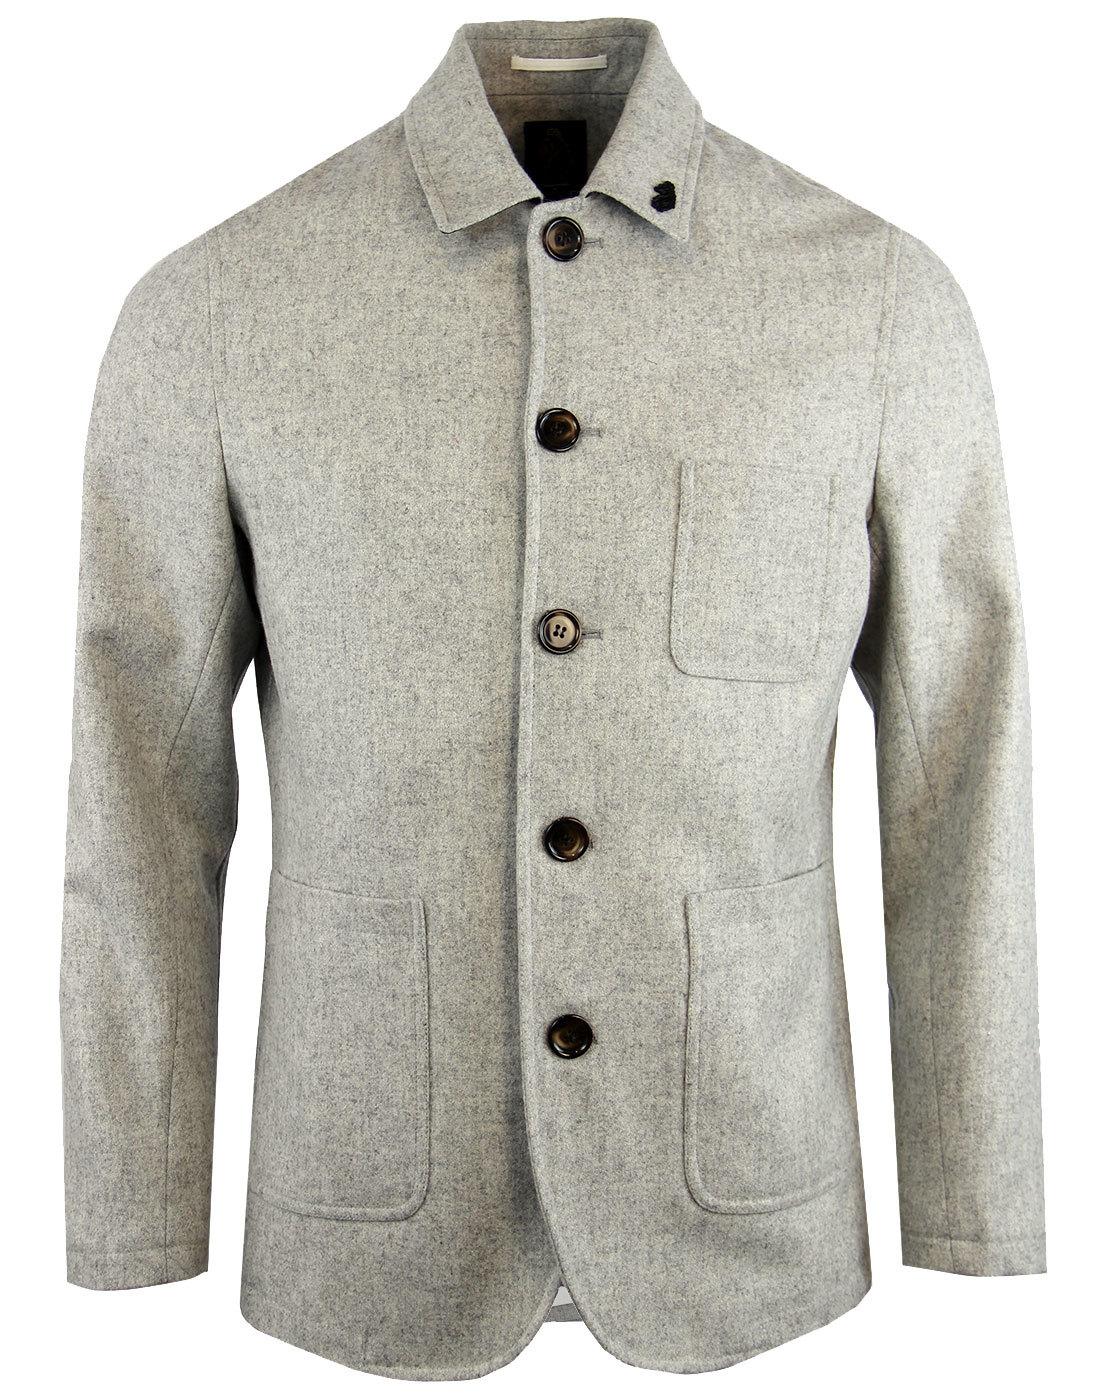 LUKE 1977 Bakerboy Retro 60s Mod Made In England Pea Coat in Grey 674b38321